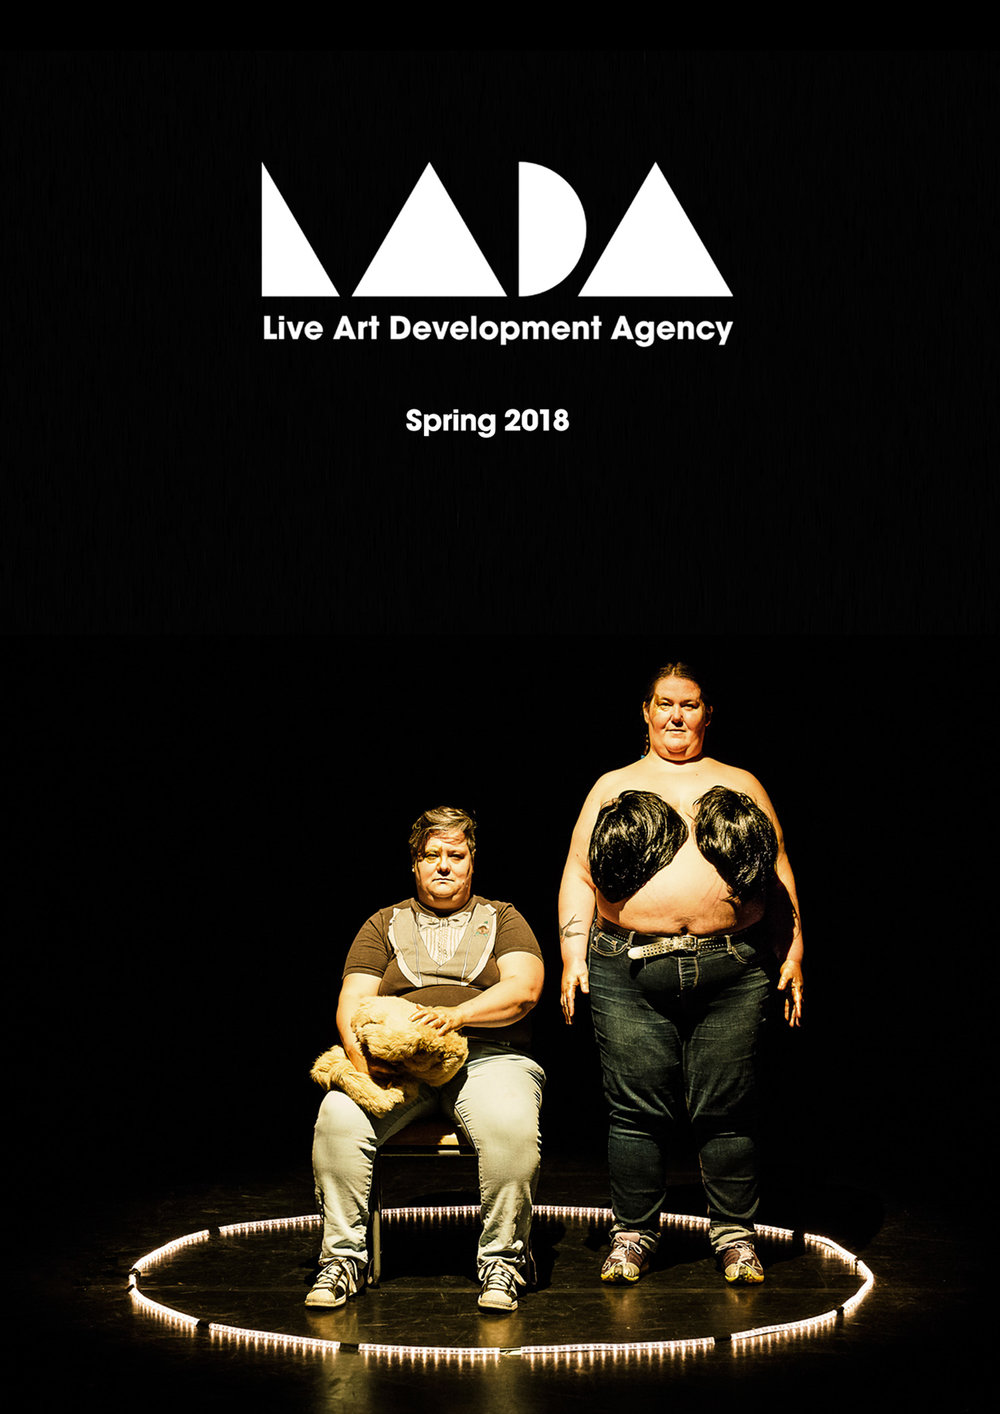 LADA   Live Art Development Agency   Swagga   Projecto O   Poster   London, 2018